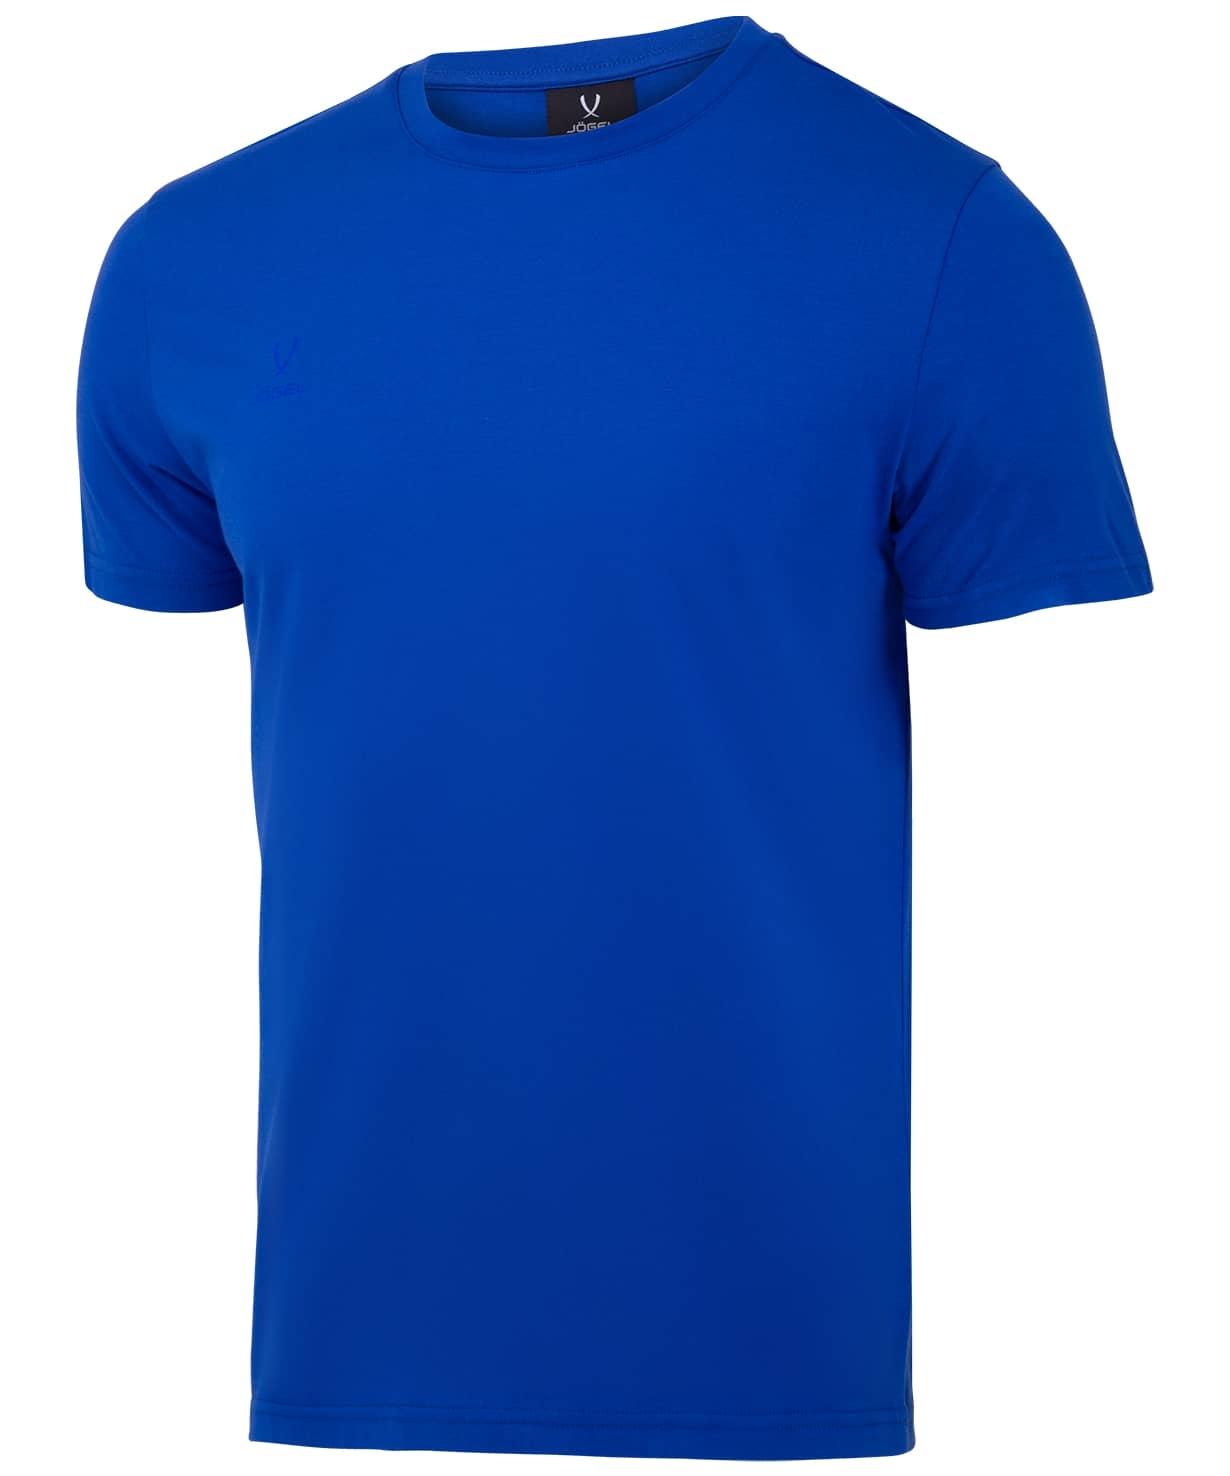 Футболка ESSENTIAL Core Tee, синий